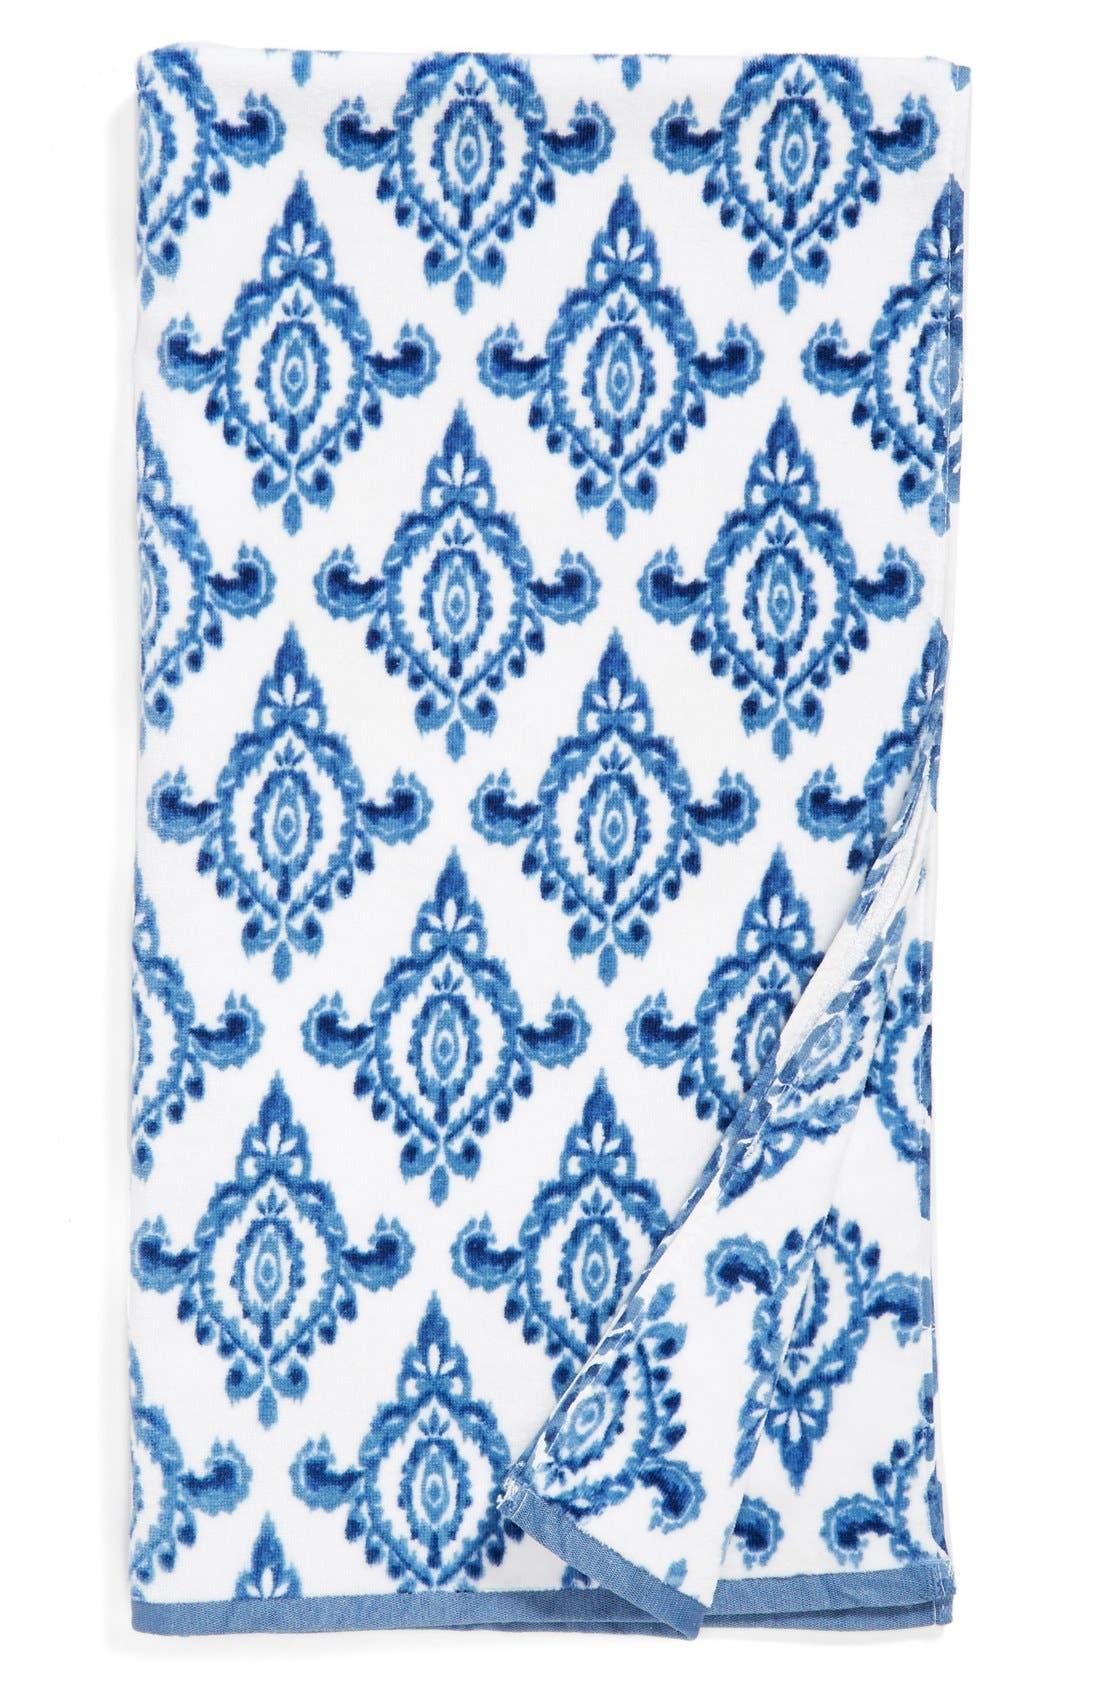 DENA HOME 'Madison' Ikat Print Bath Towel, Main, color, 410